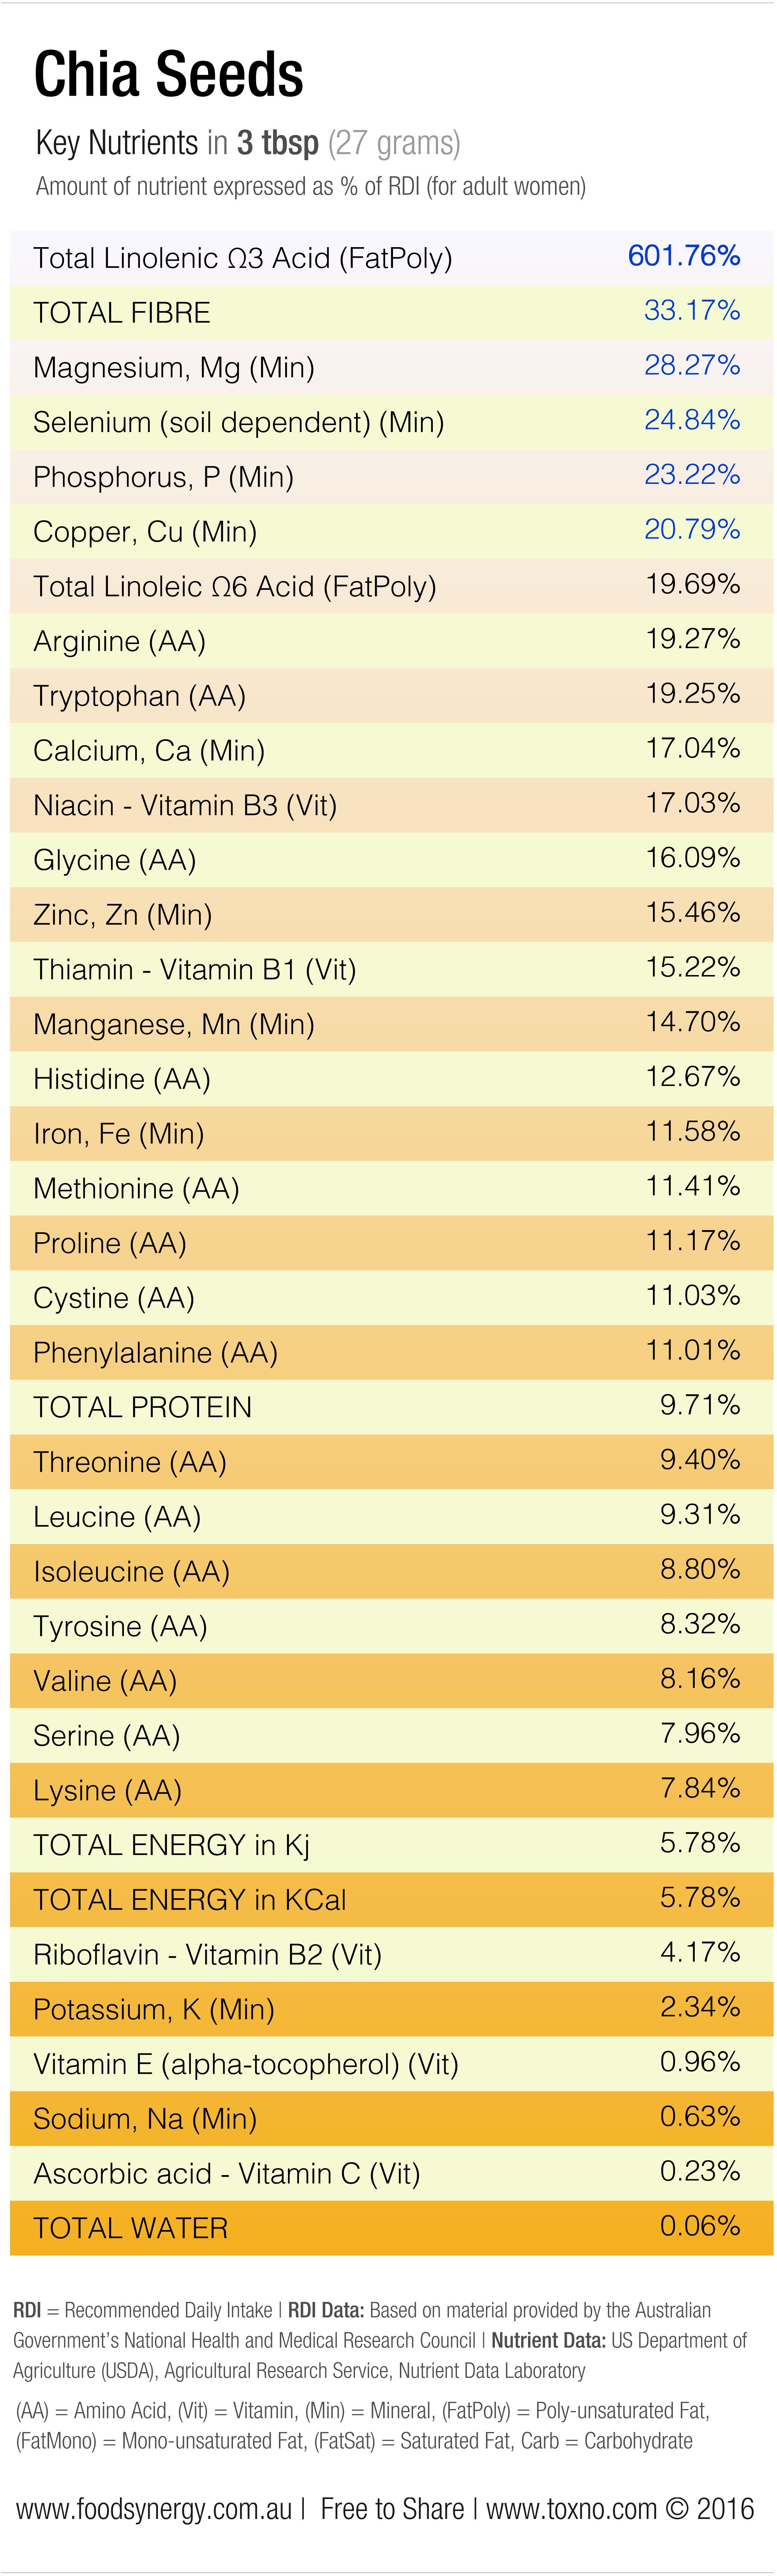 Chia-Seed-Nutrients1